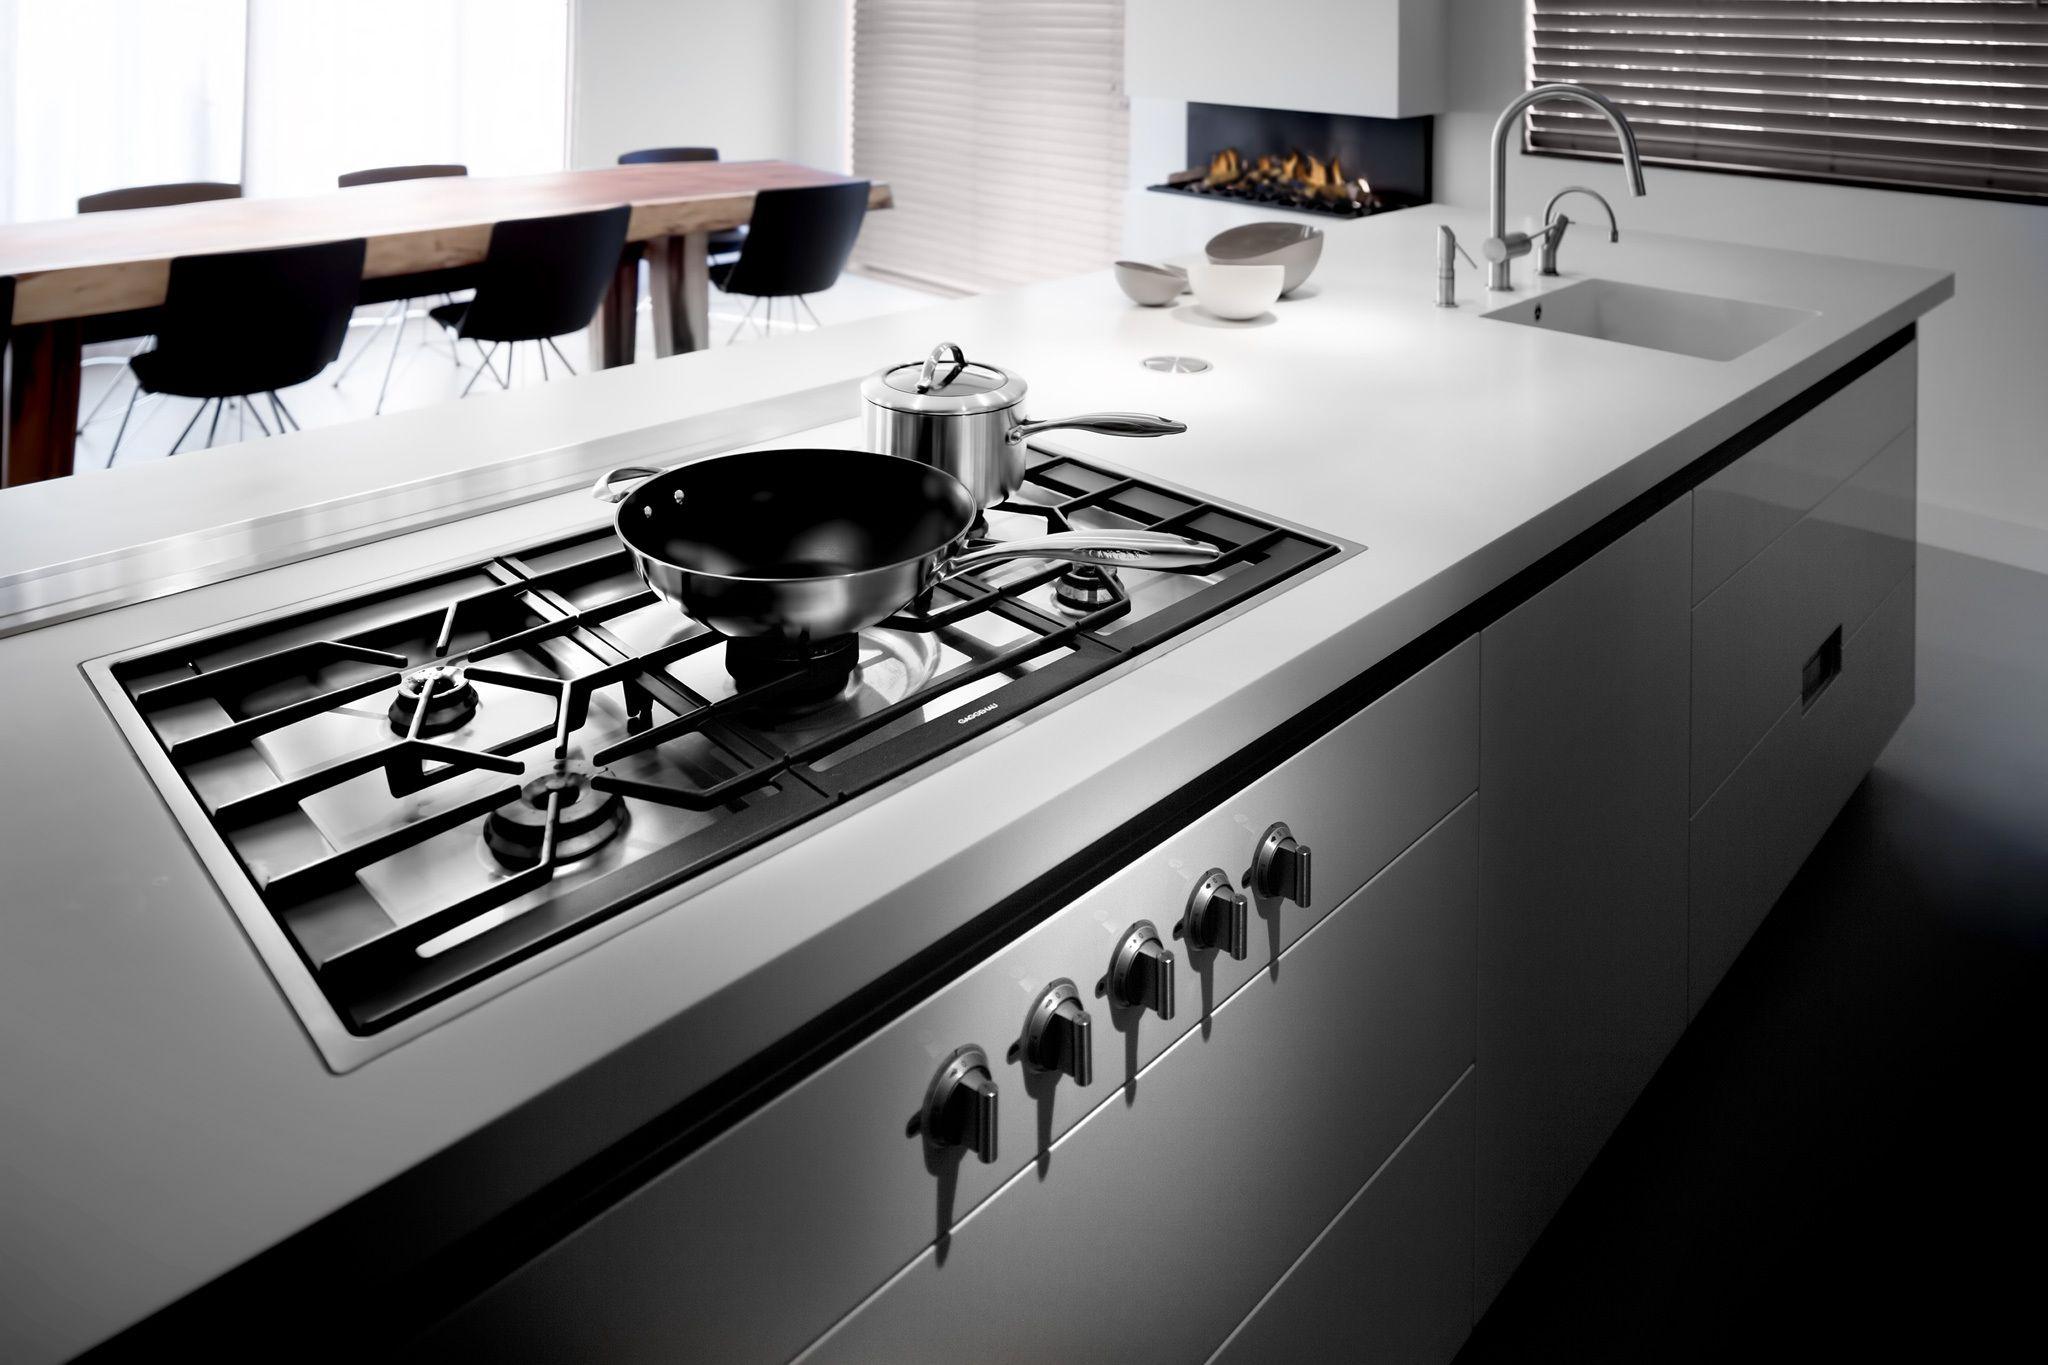 culimaat high end kitchens interiors italiaanse keukens en maatkeukens futuro culimatt